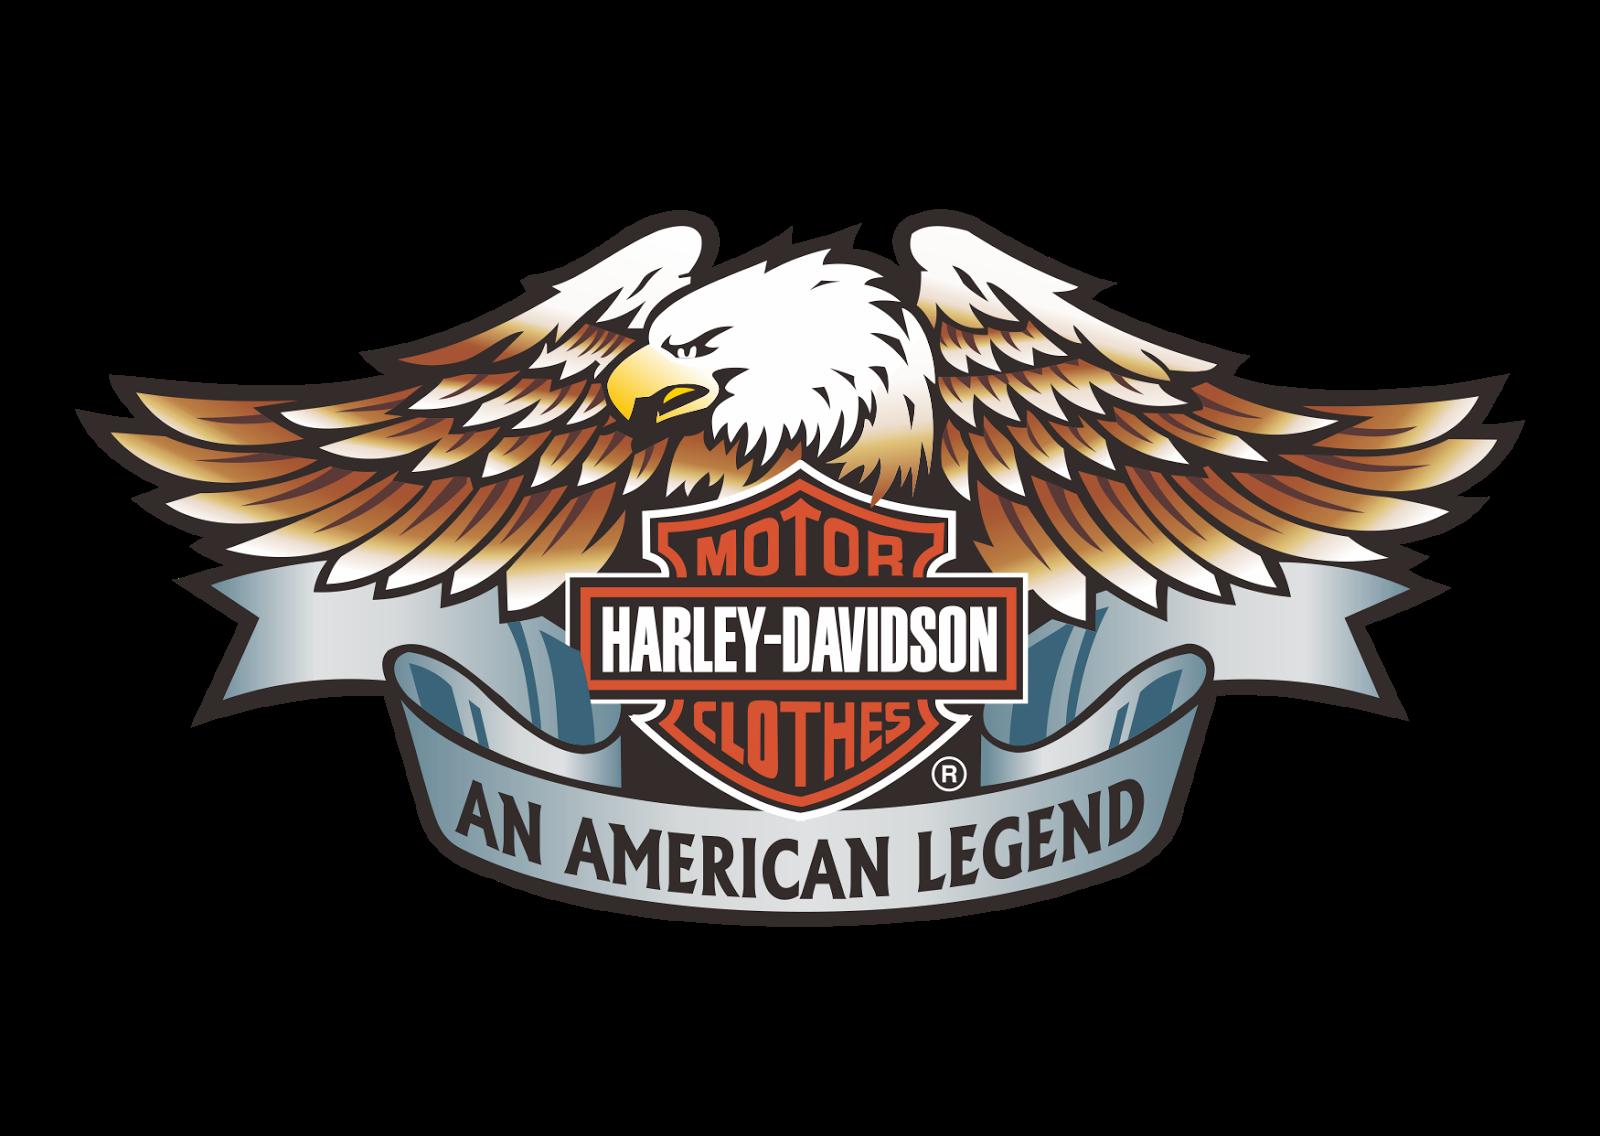 Harley Davidson Motor Clothes Logo Vector | Harley ...